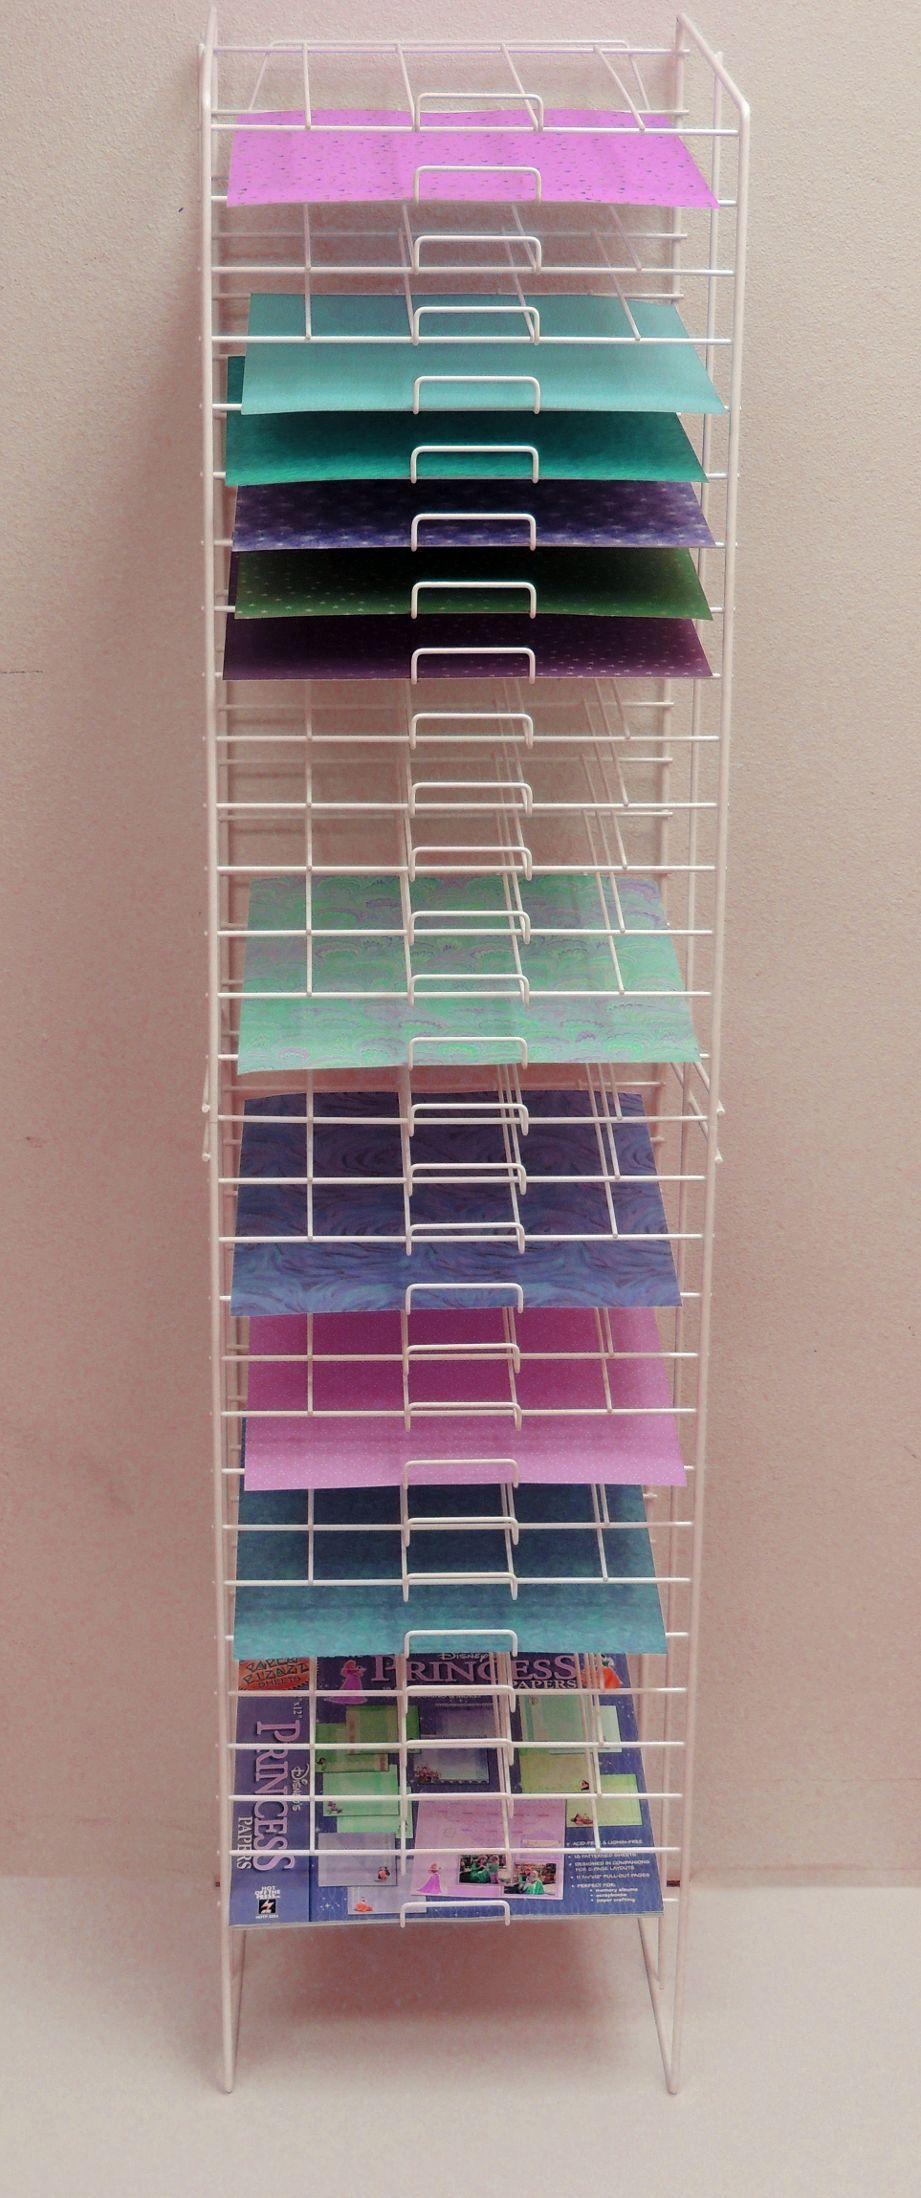 Vinyl sheets for crafts - Chandler Creations Craft Storage